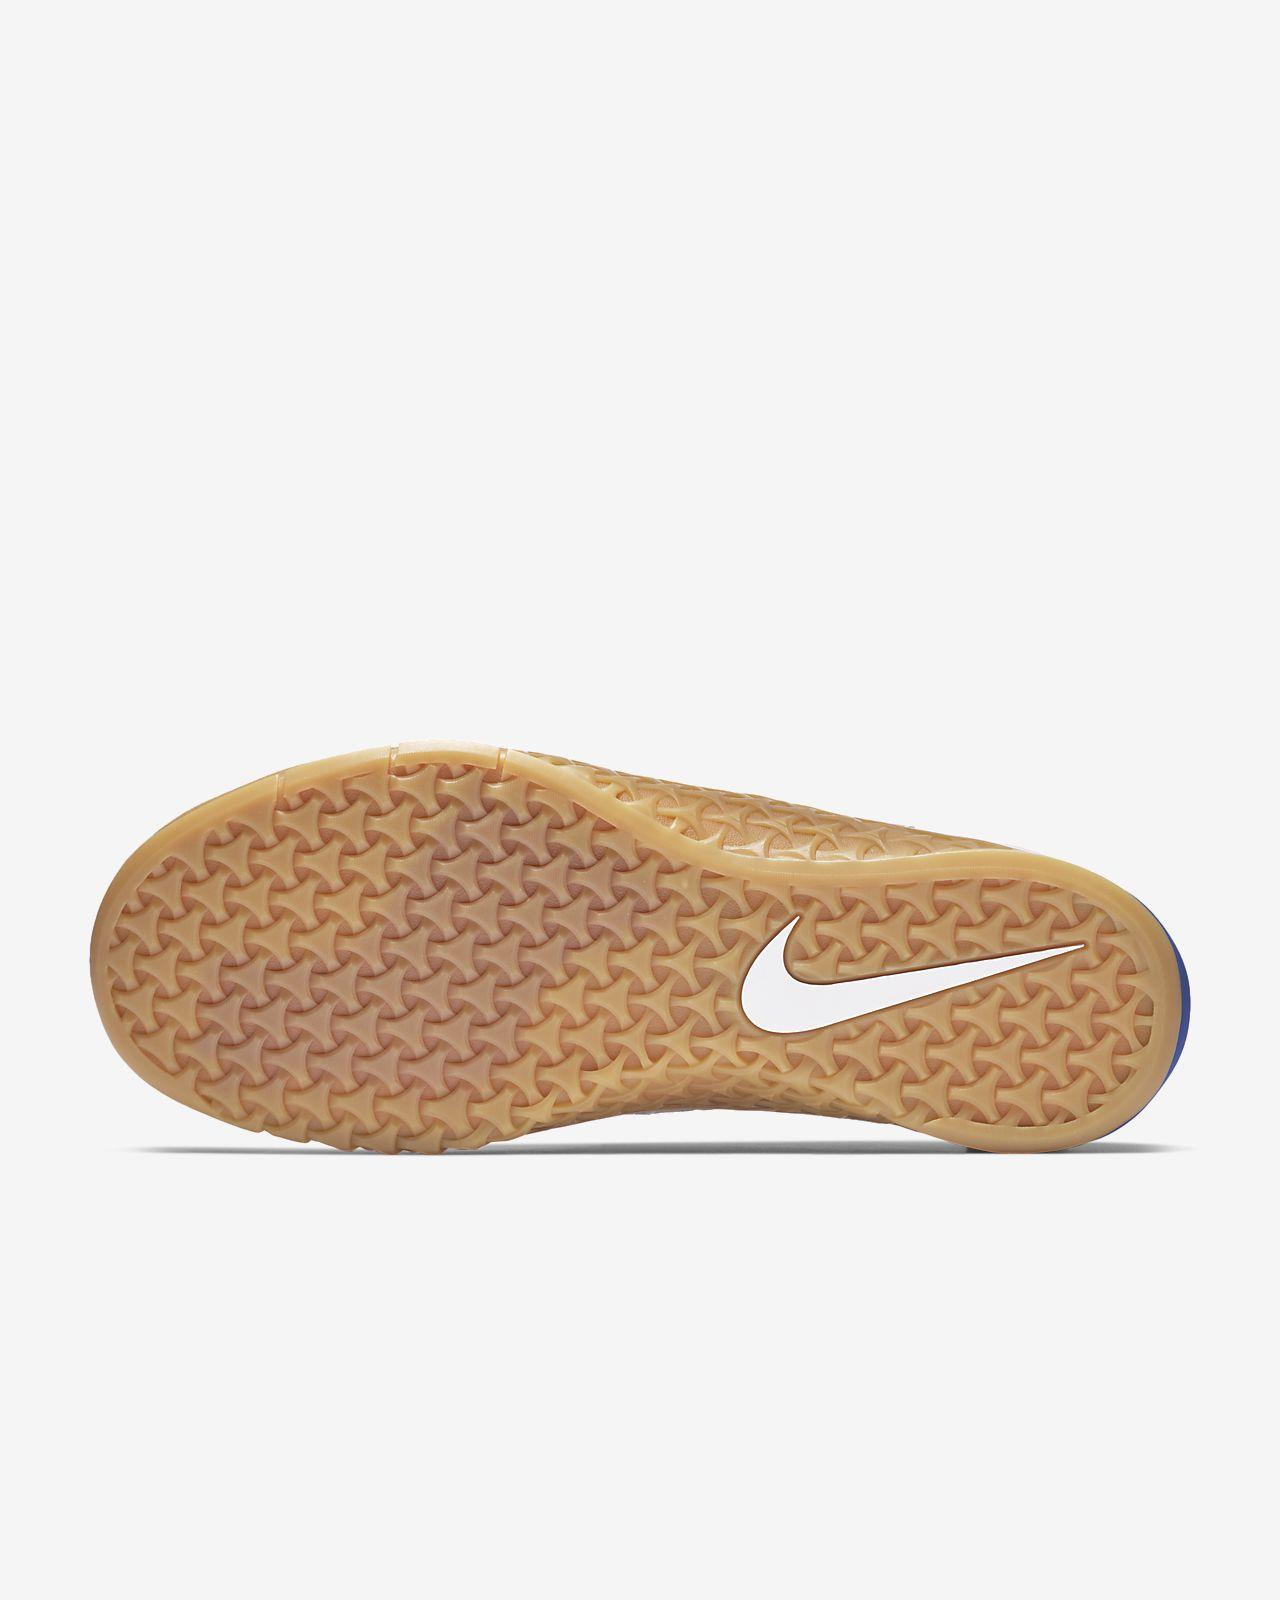 396380326aab ... Nike Metcon 4 XD X Whiteboard Men s Cross-Training Weightlifting Shoe